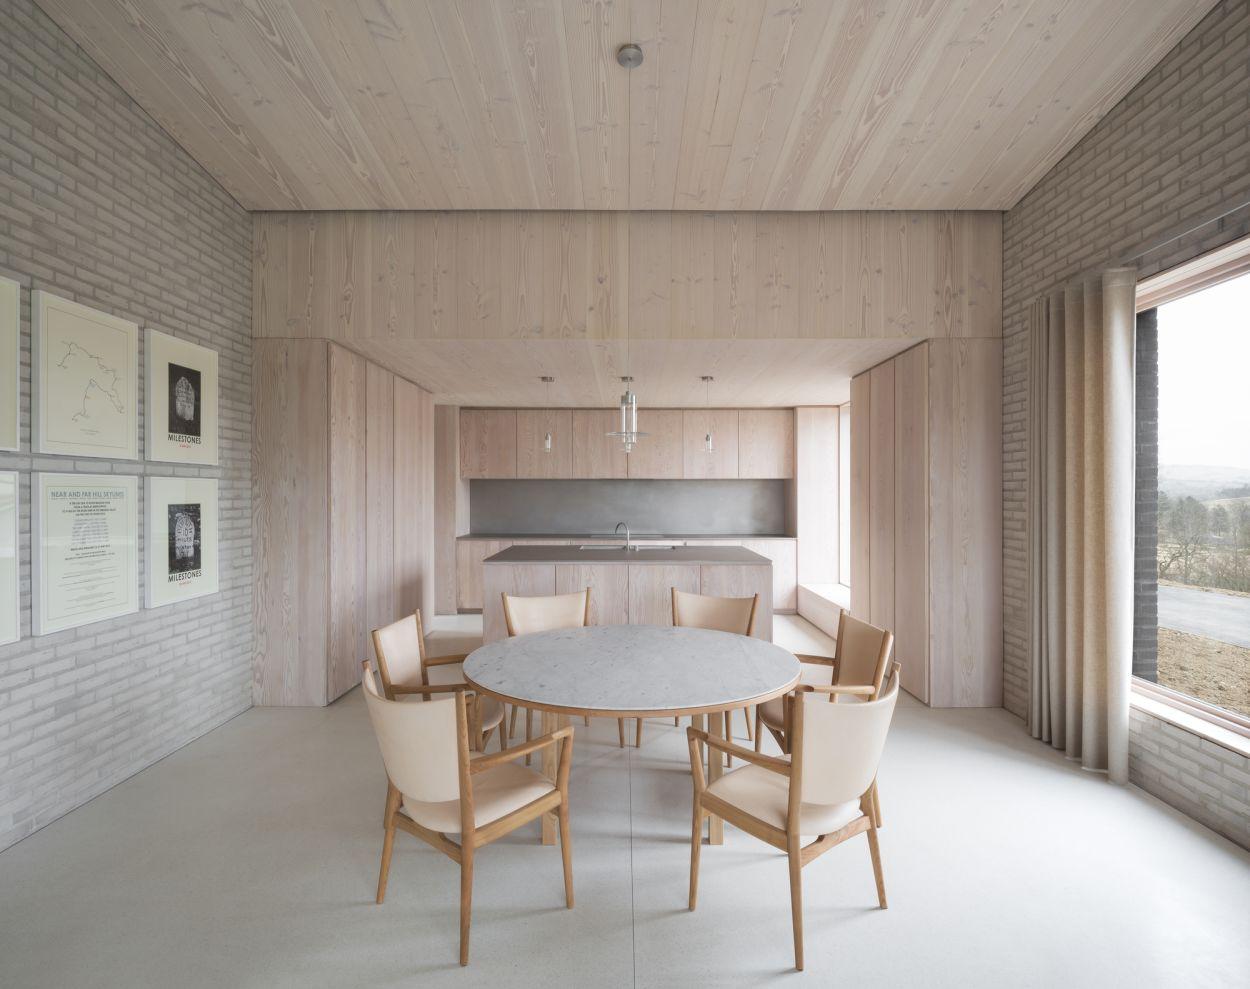 John Pawson, Living Architecture, The Life House, Lebenshaus, Holzdecke